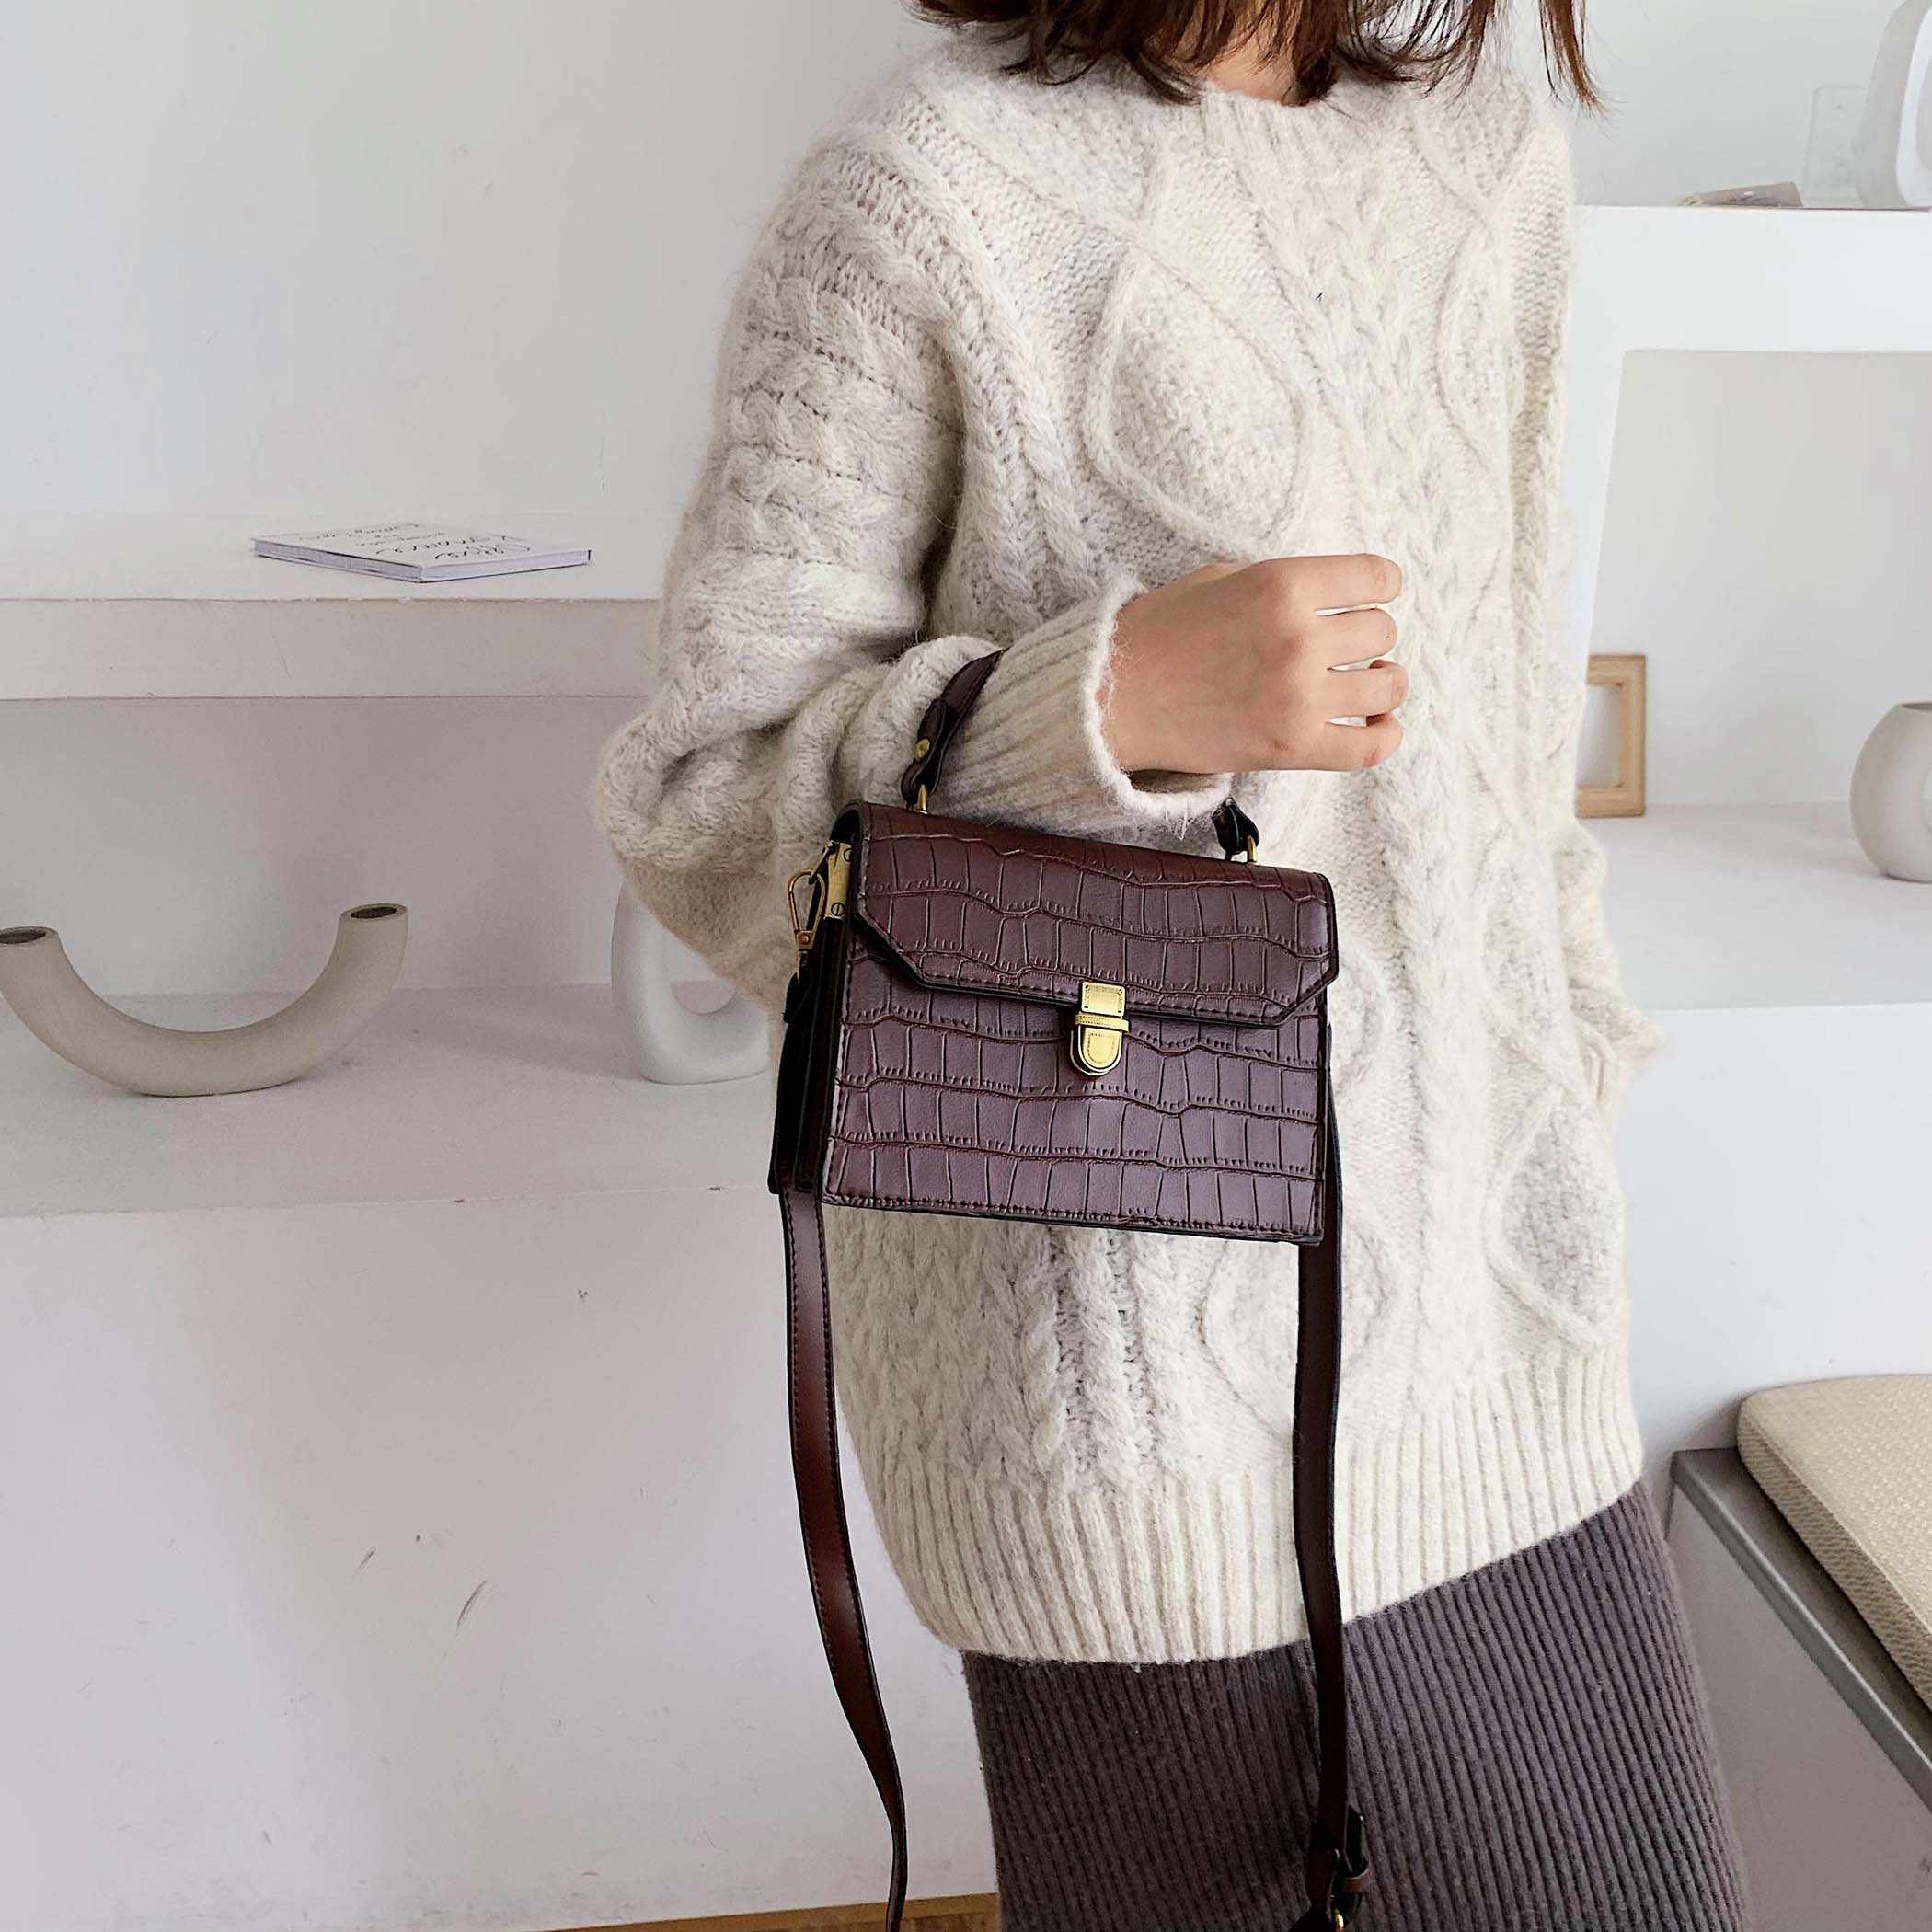 Stone Pattern PU Leather Crossbody Bags For Women 2019 MINI Shoulder Messenger Bag Female Fashion Handbags Totes